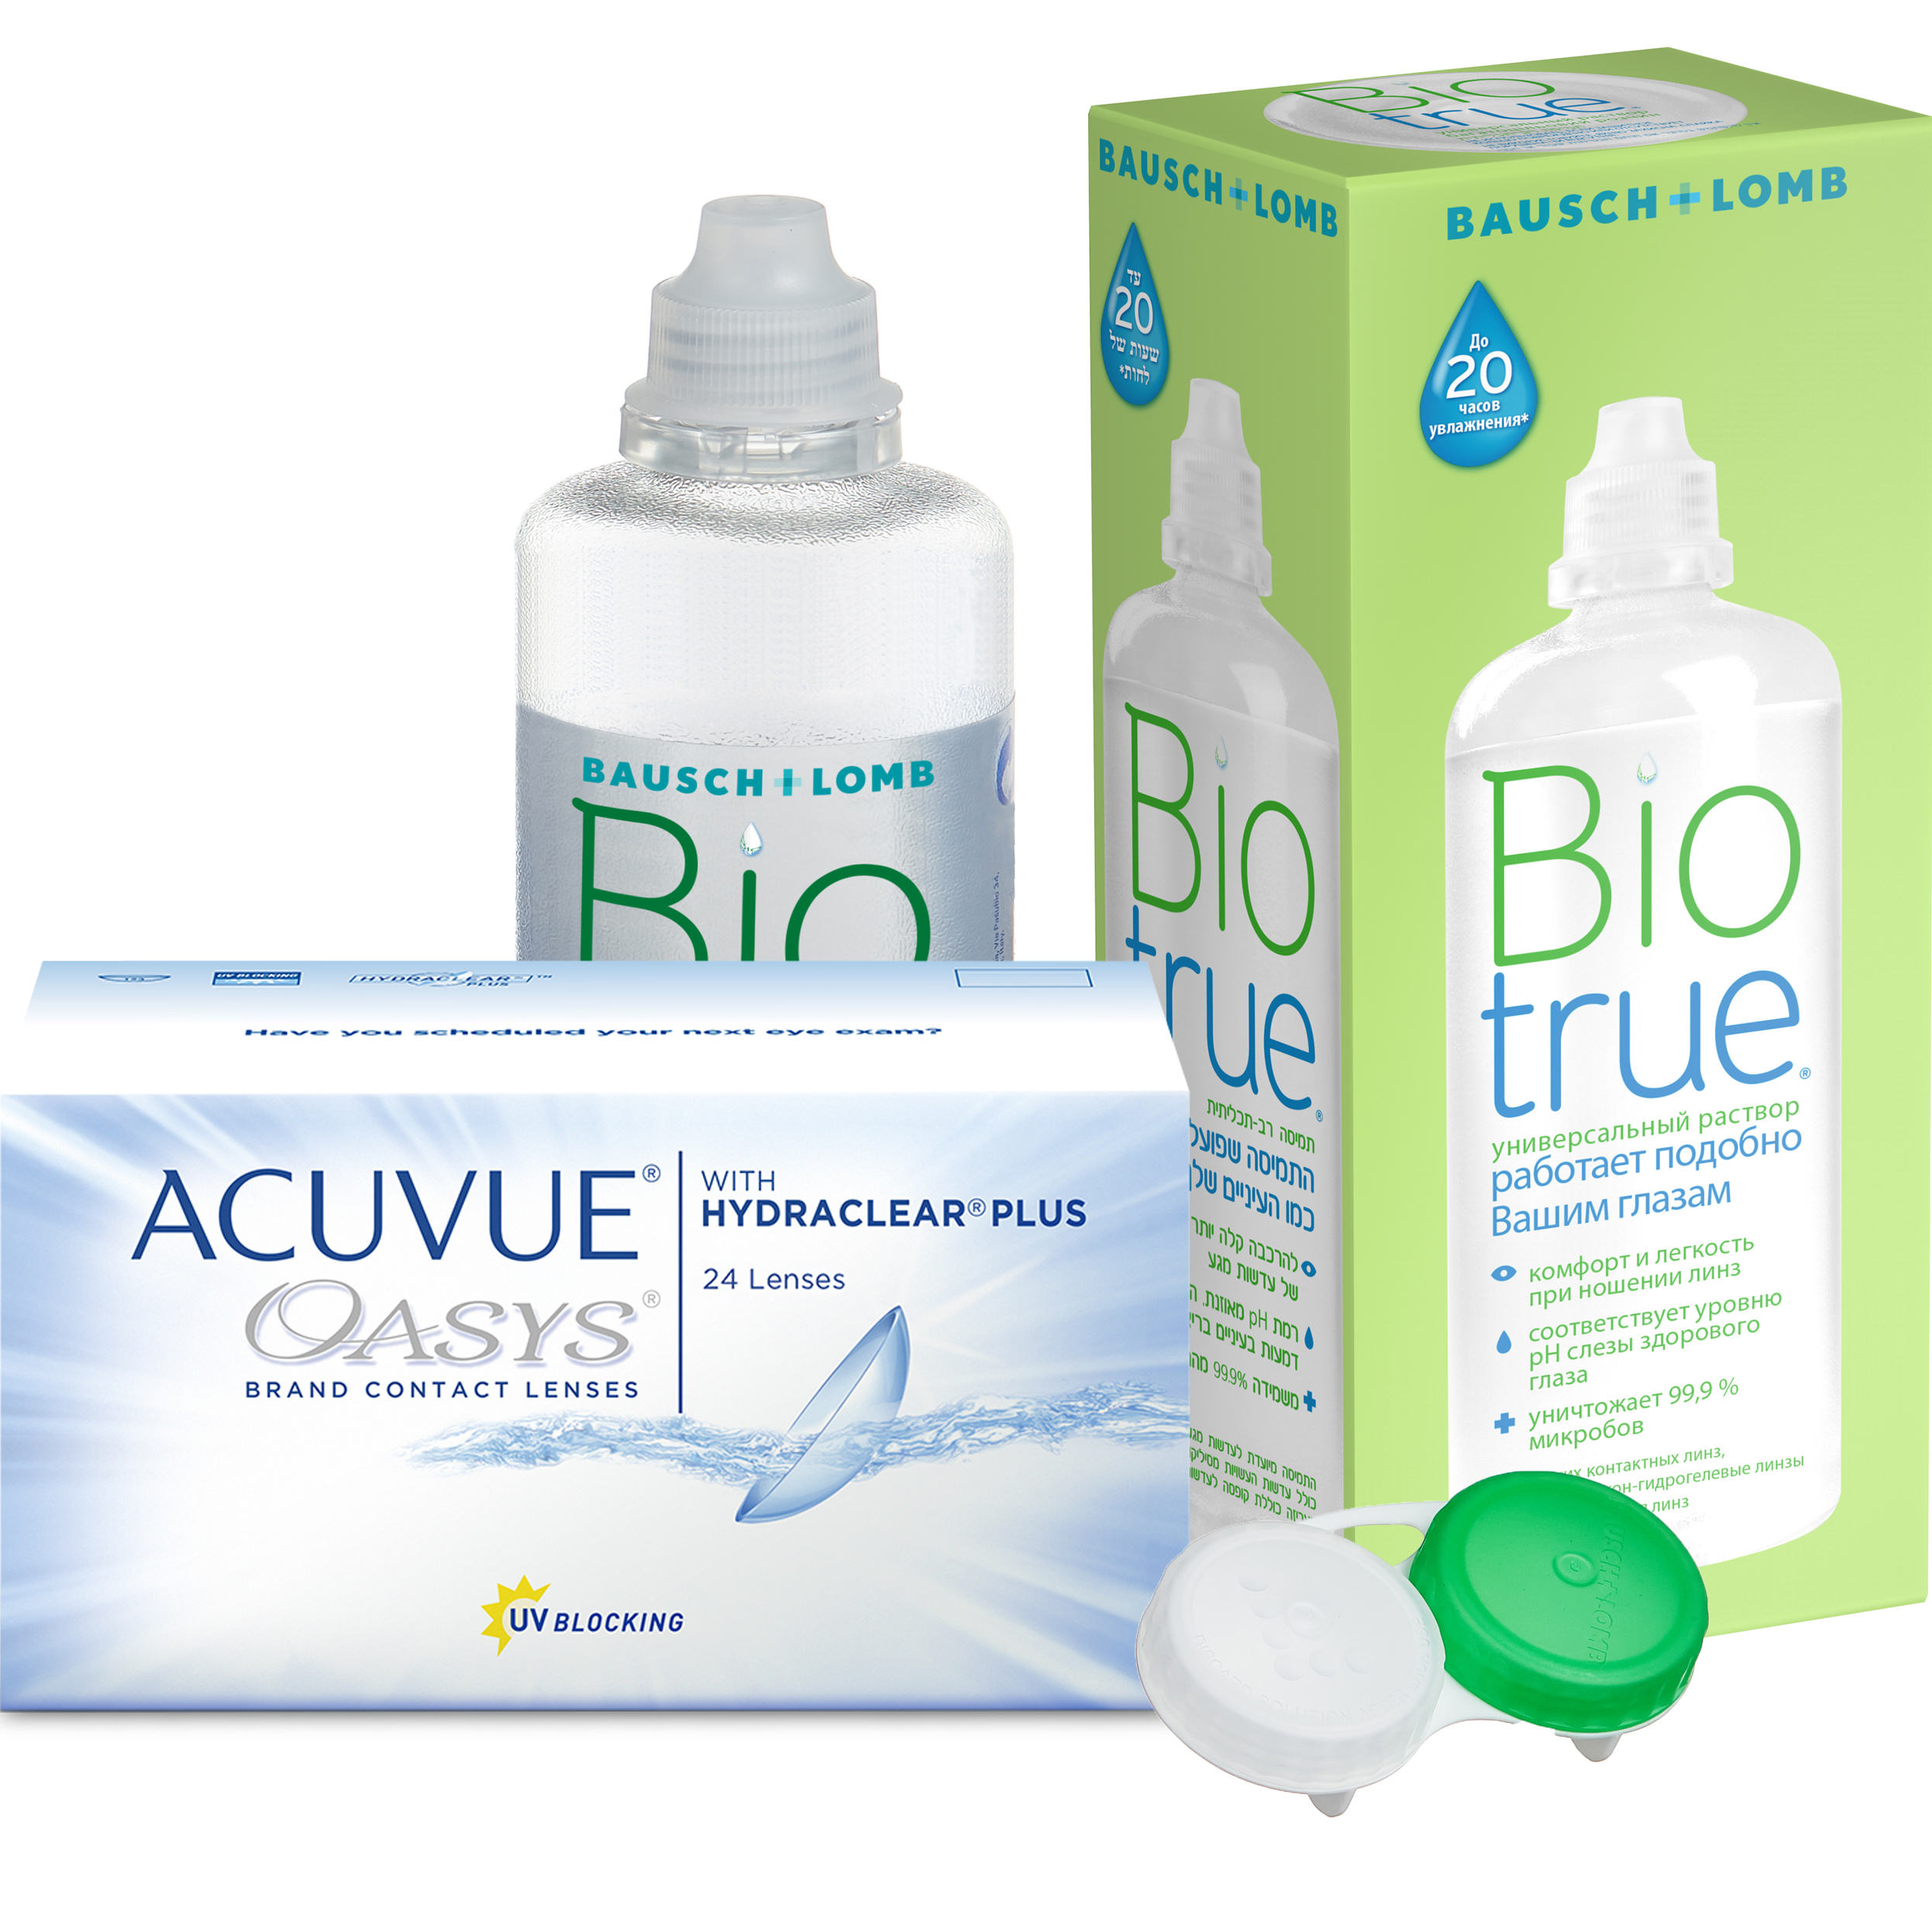 Купить Oasys with Hydraclear Plus 24 линзы + Biotrue, Контактные линзы Acuvue Oasys with Hydraclear Plus 24 линзы R 8.8 +0, 25 + Biotrue 300 мл